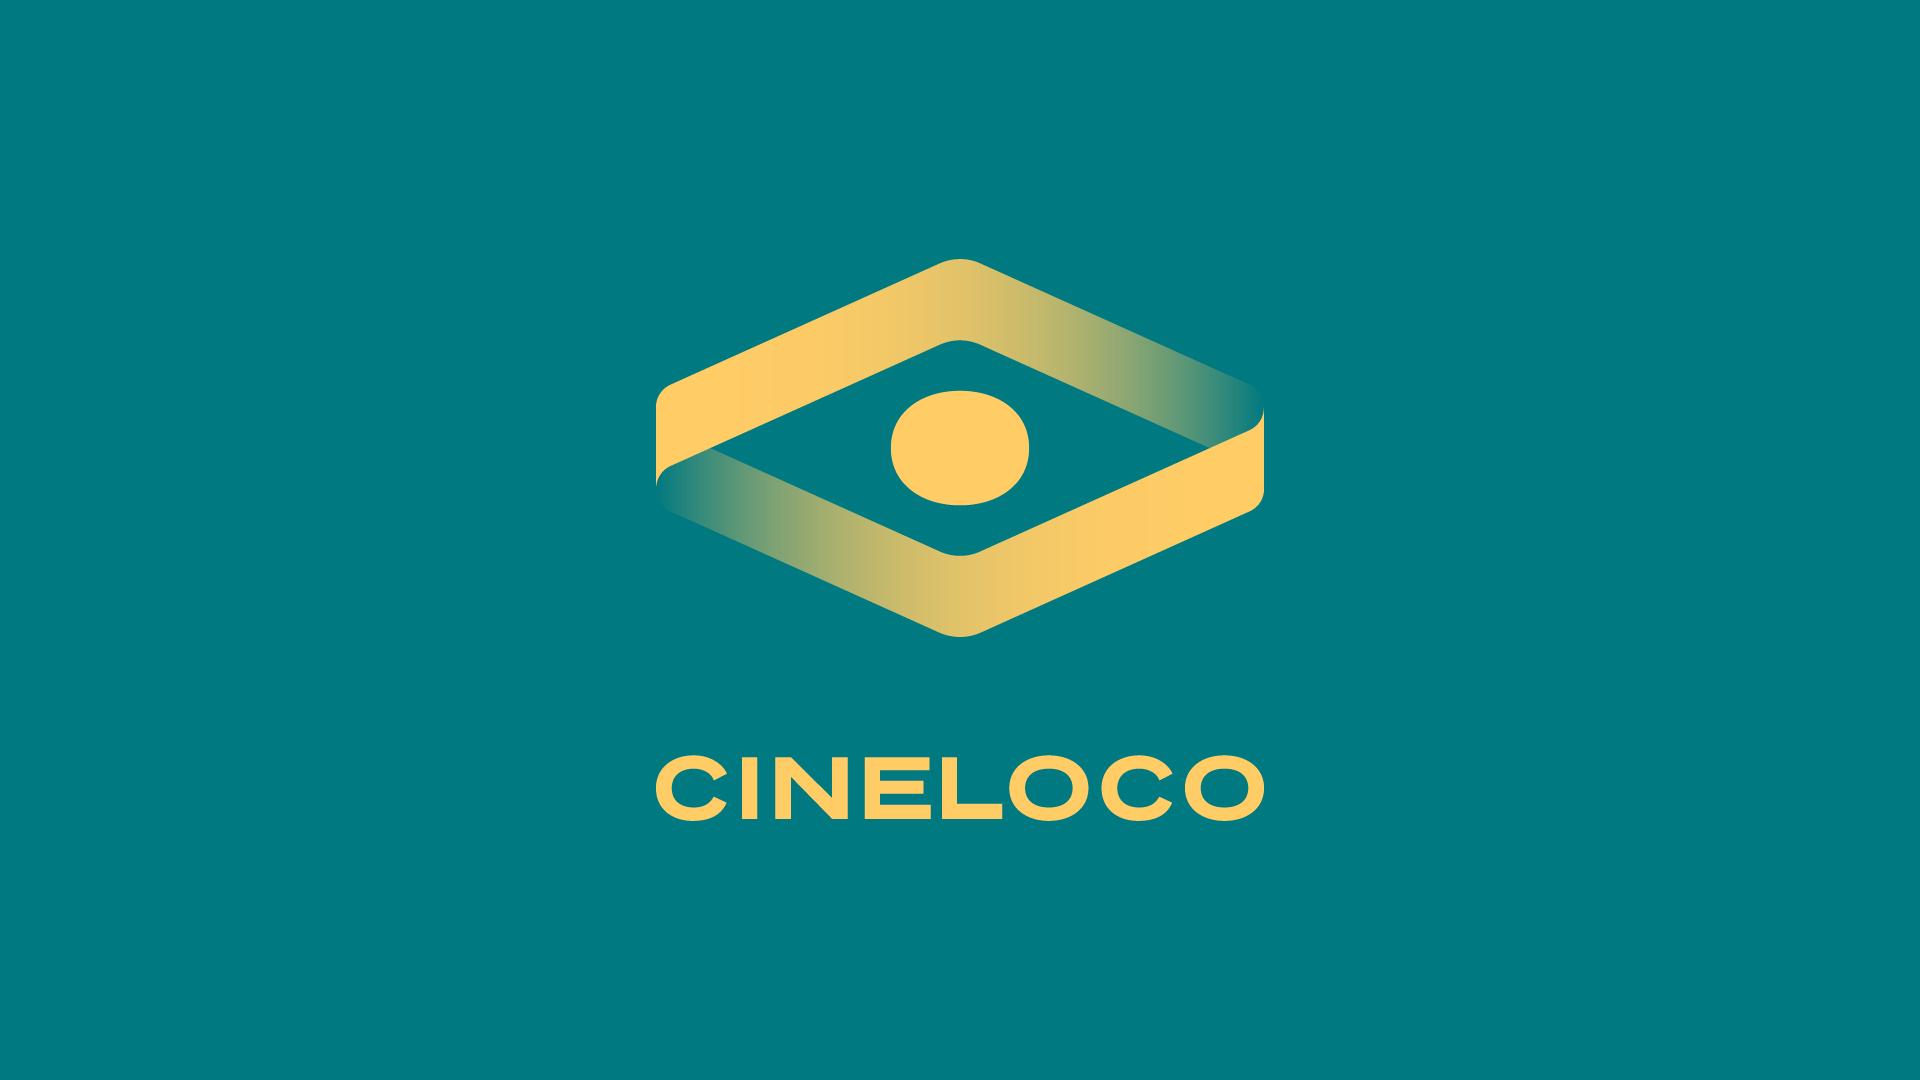 Cineloco_1.png